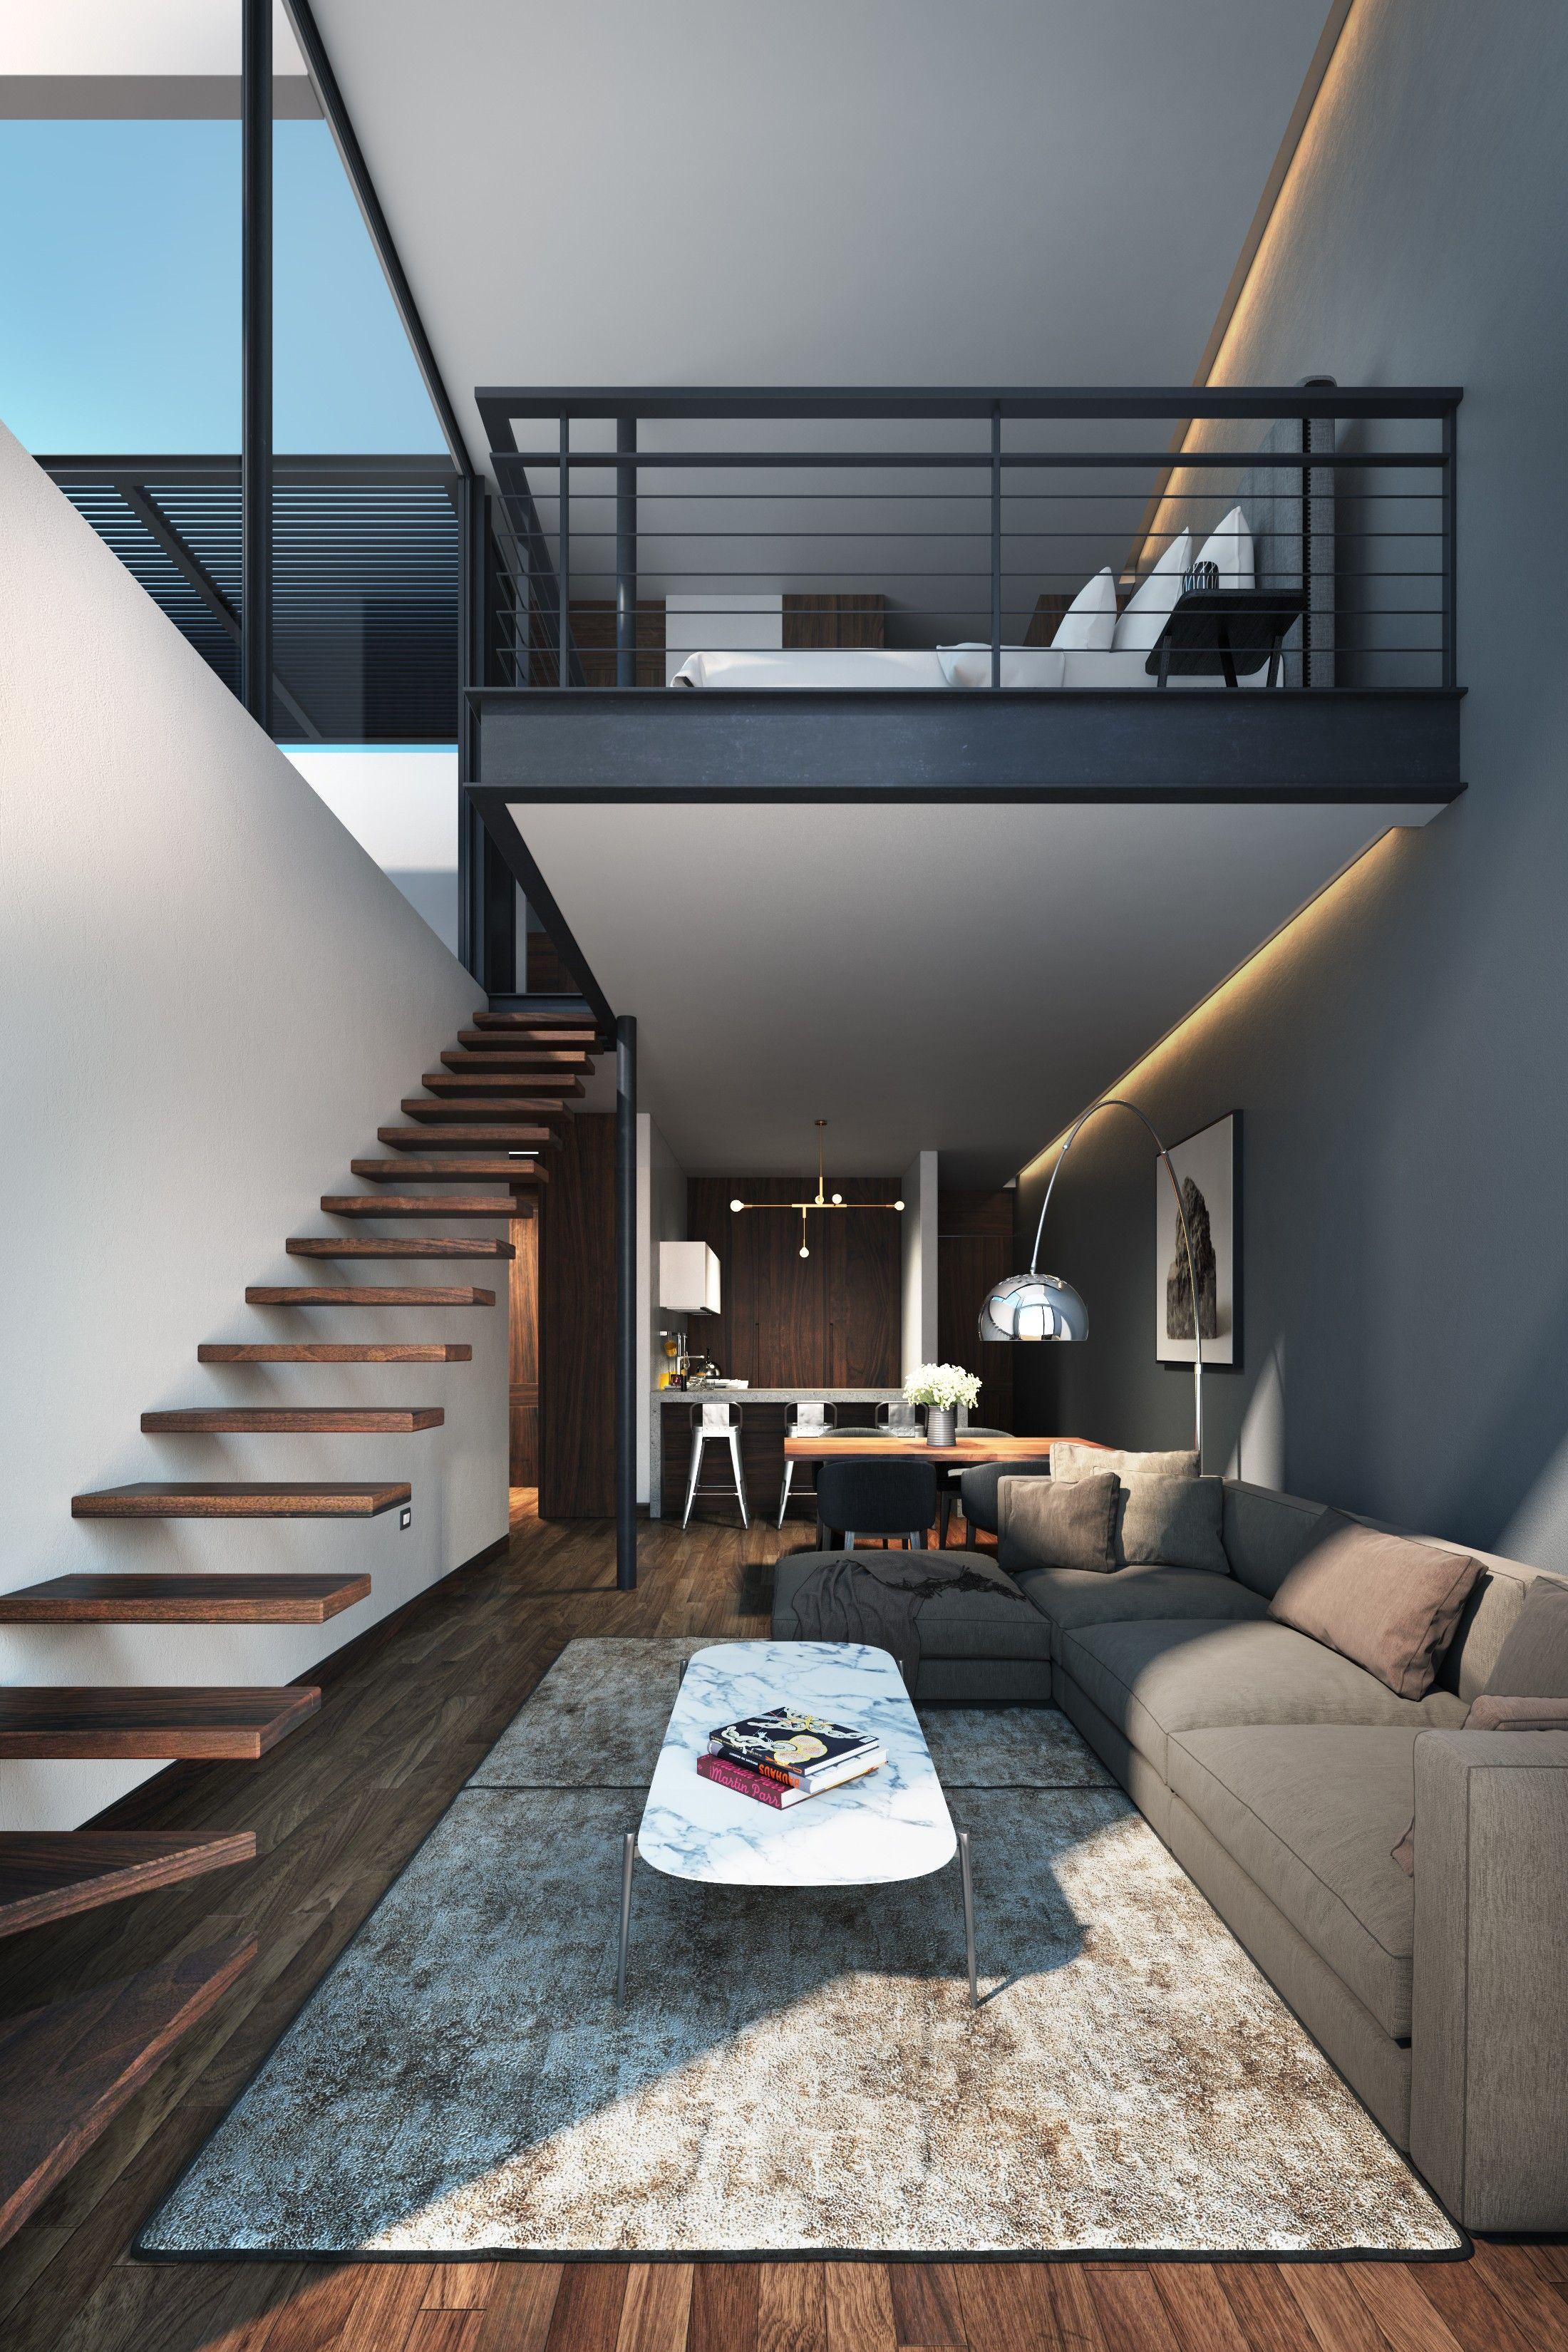 Loft bedroom staircase  Archello  Athetea  Pinterest  Interiors Lofts and Architecture